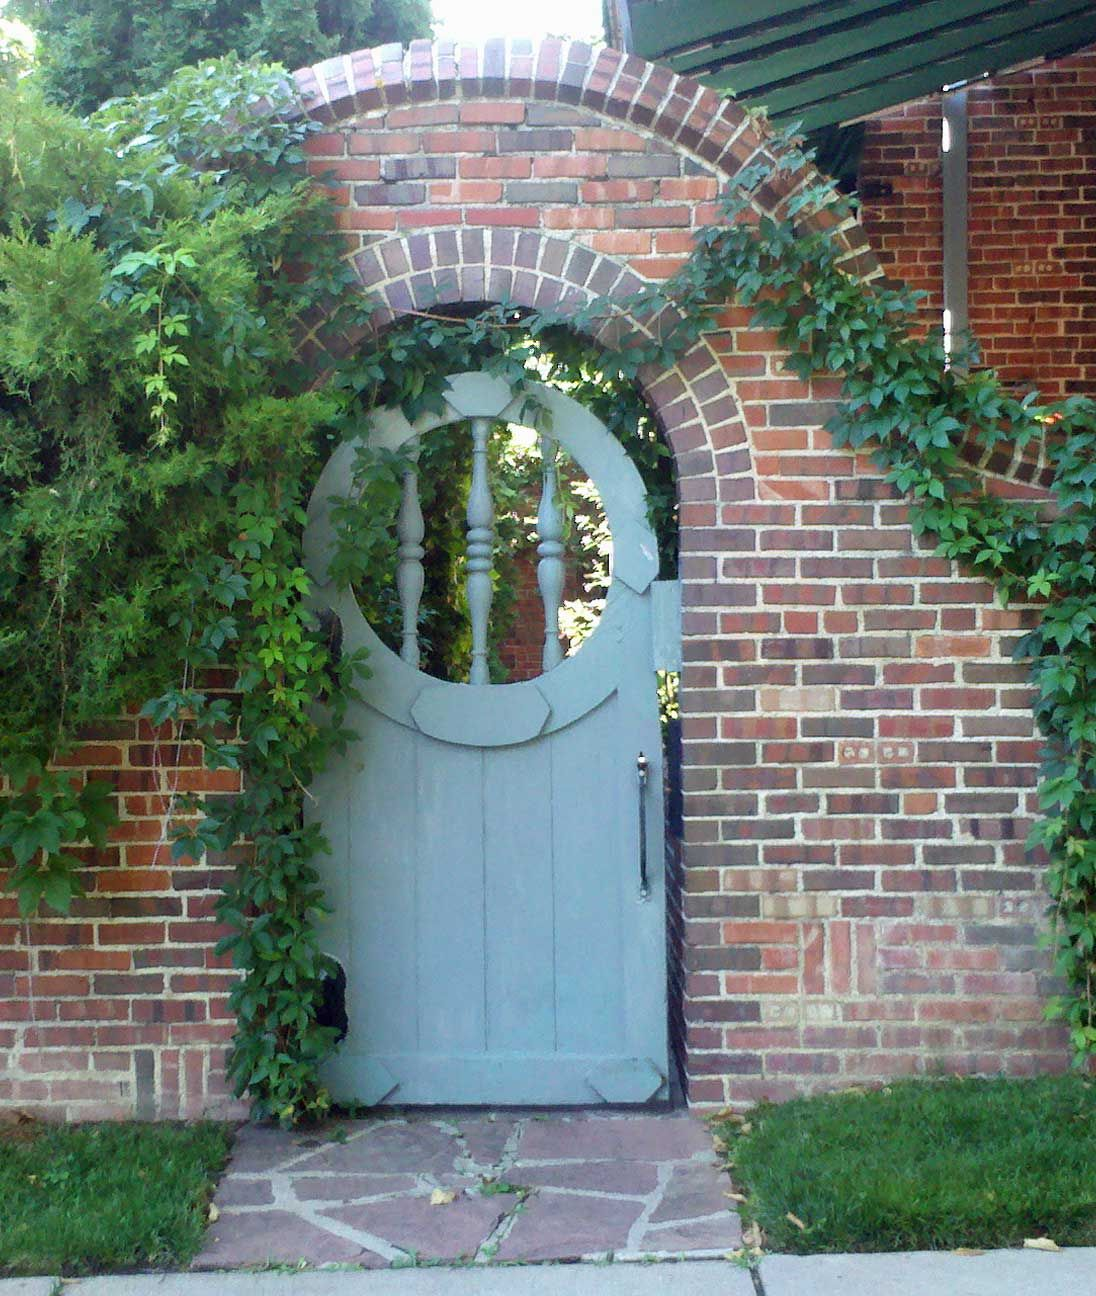 The Art Garden On The Street 10th Avenue Denver Brick Wall Gardens Wooden Garden Gate Brick Garden